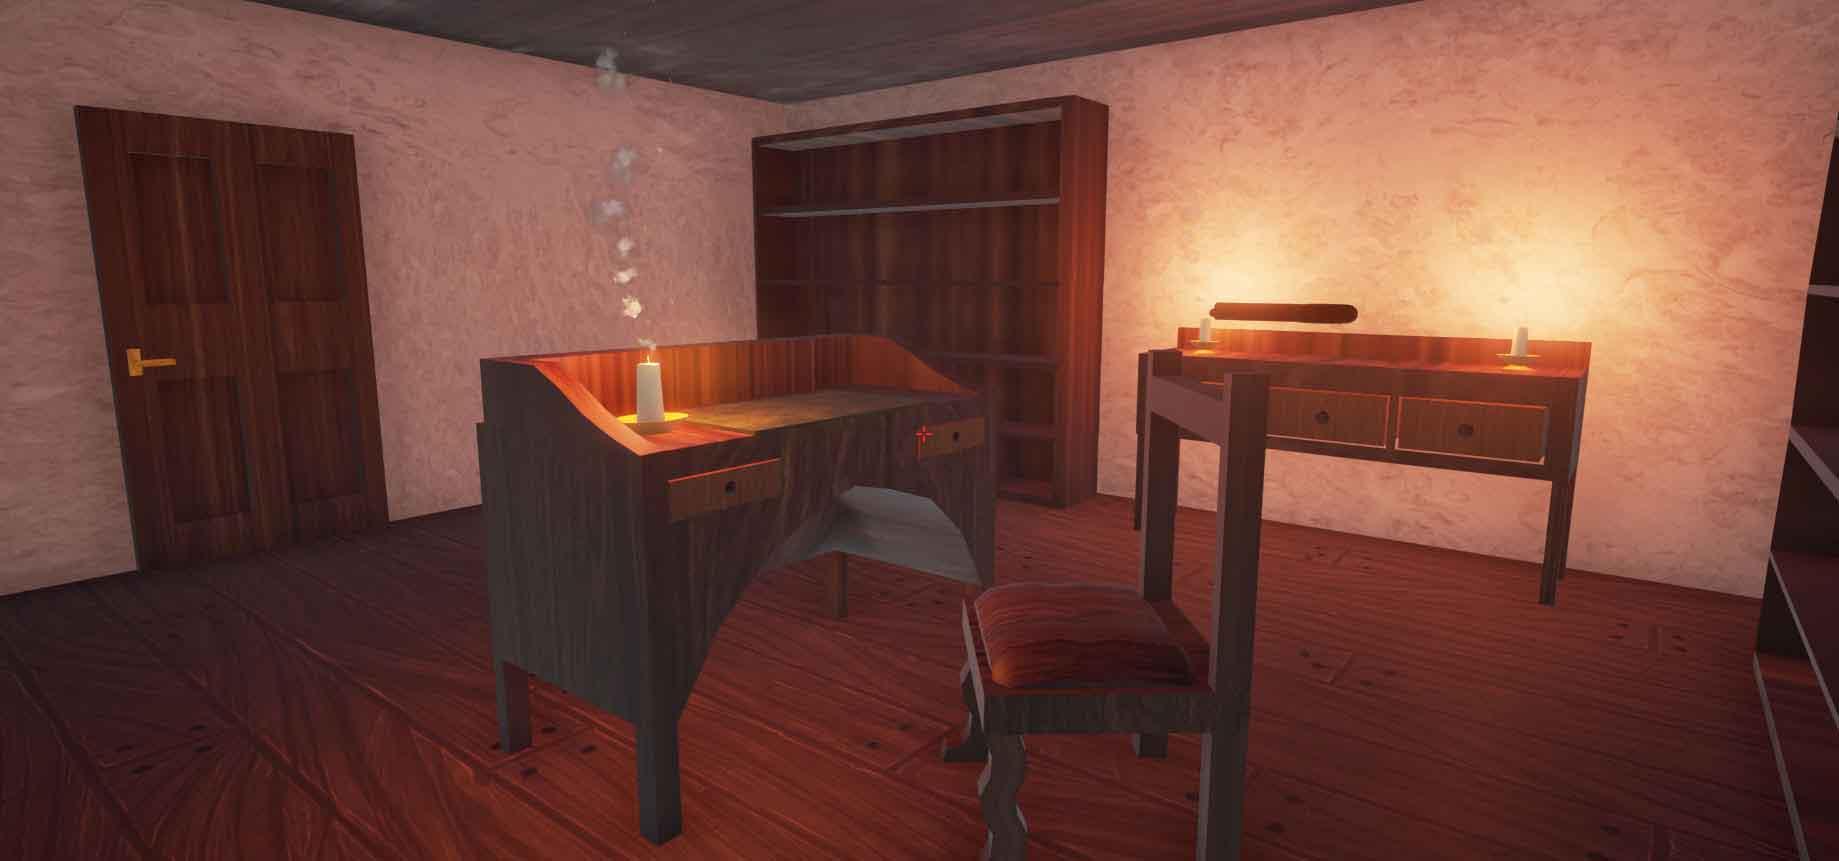 Computer Games Design